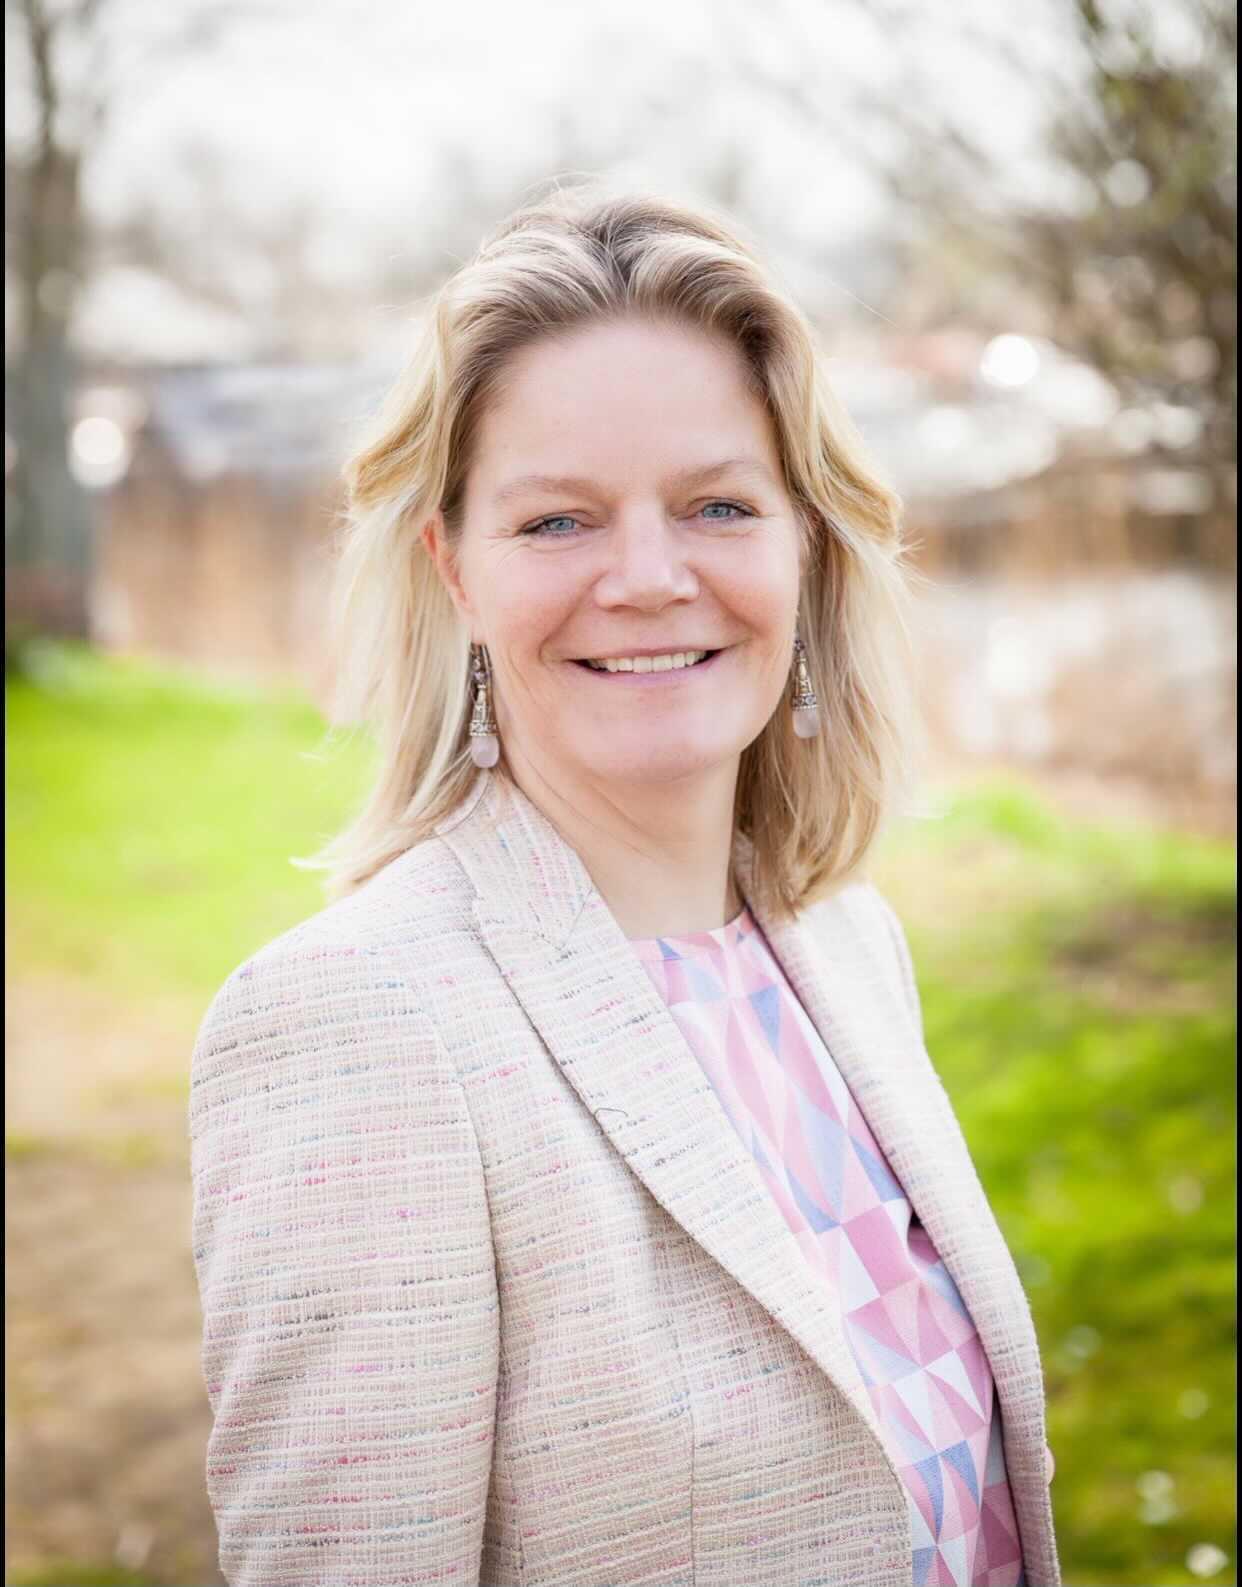 Nicole Maarsen, Co-founder of Home.Earth